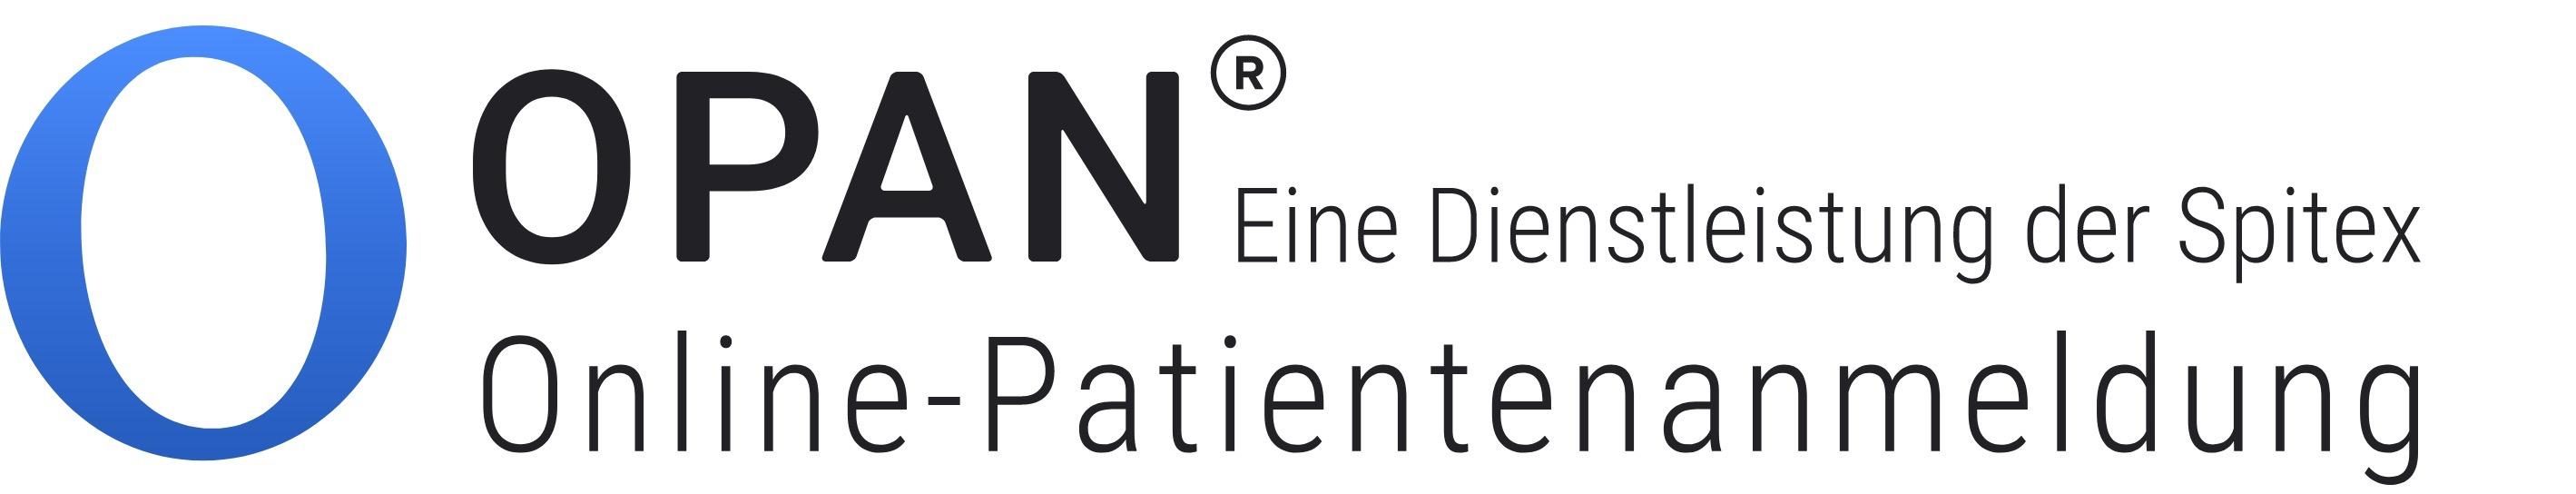 OPAN Patientenanmeldung